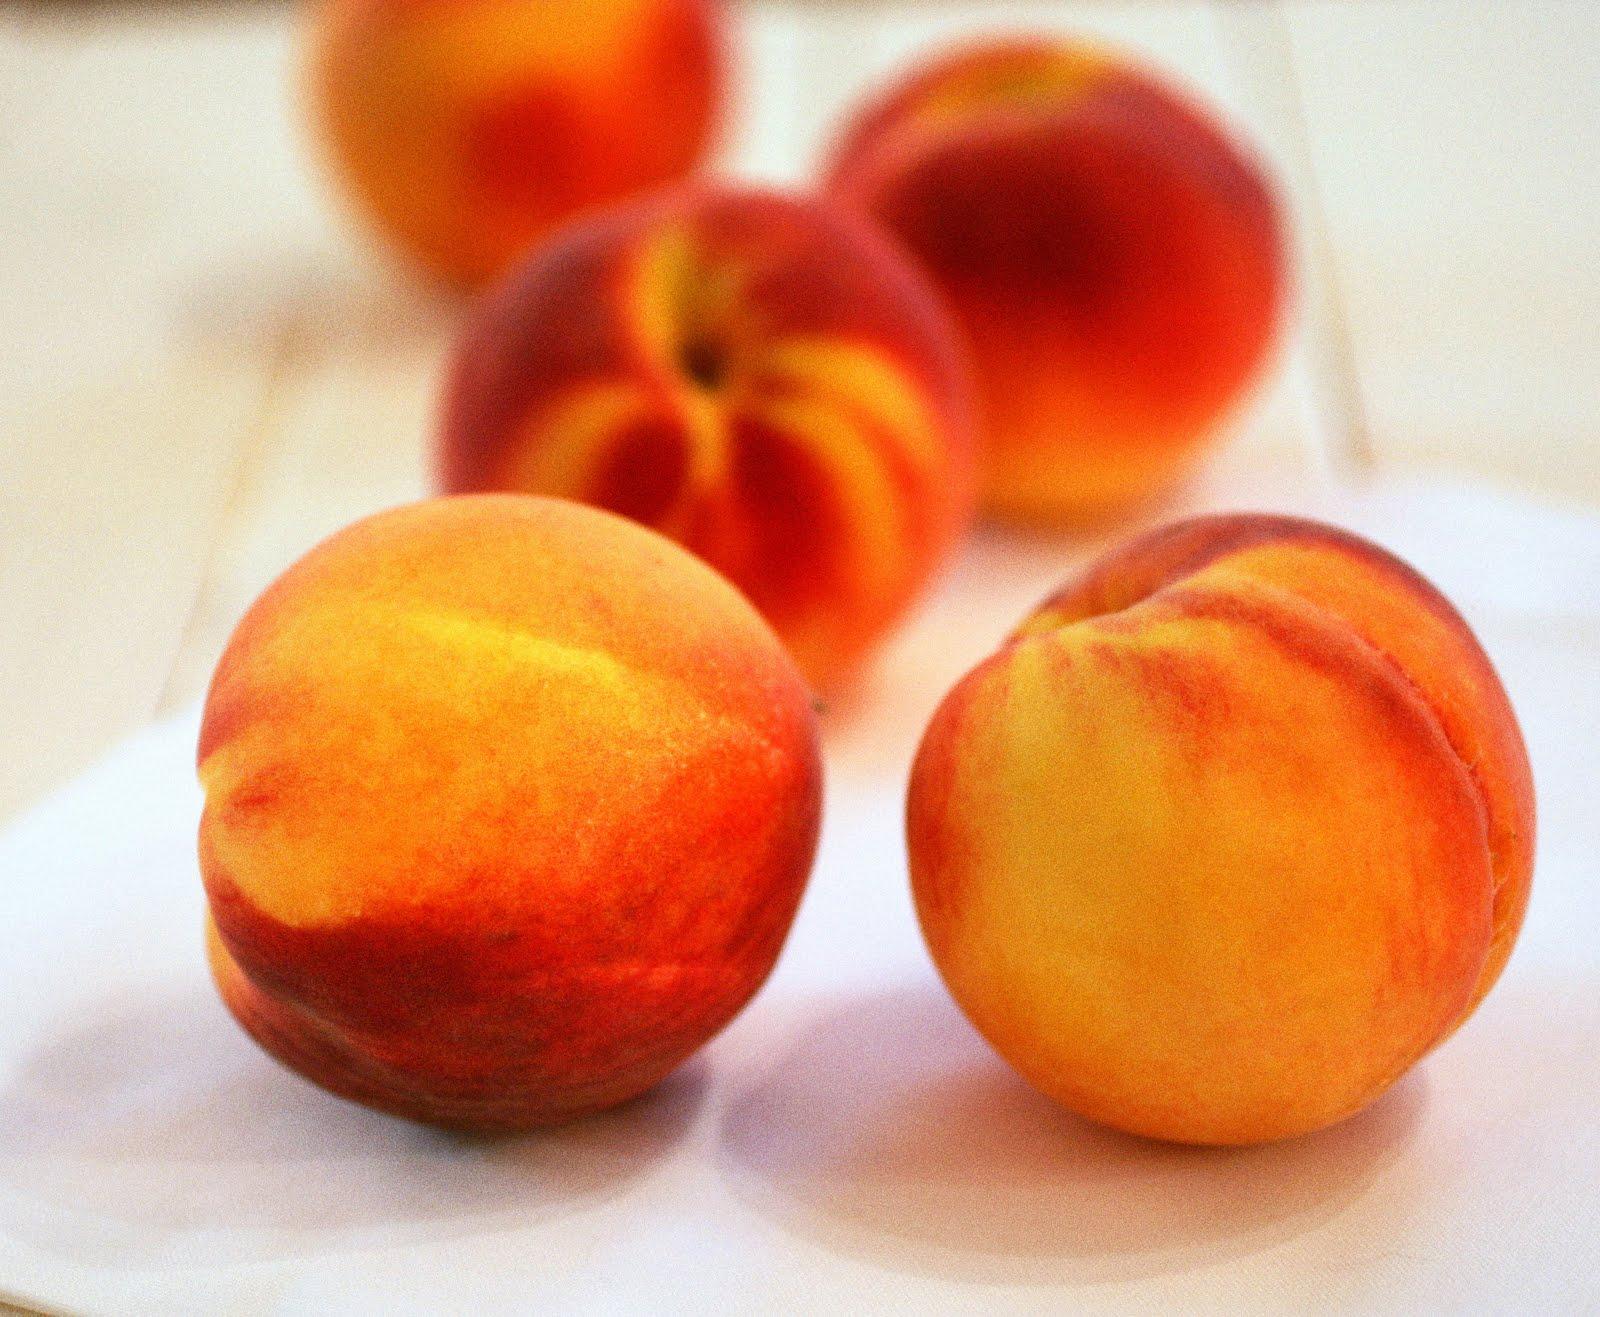 Peach tart 002edit3